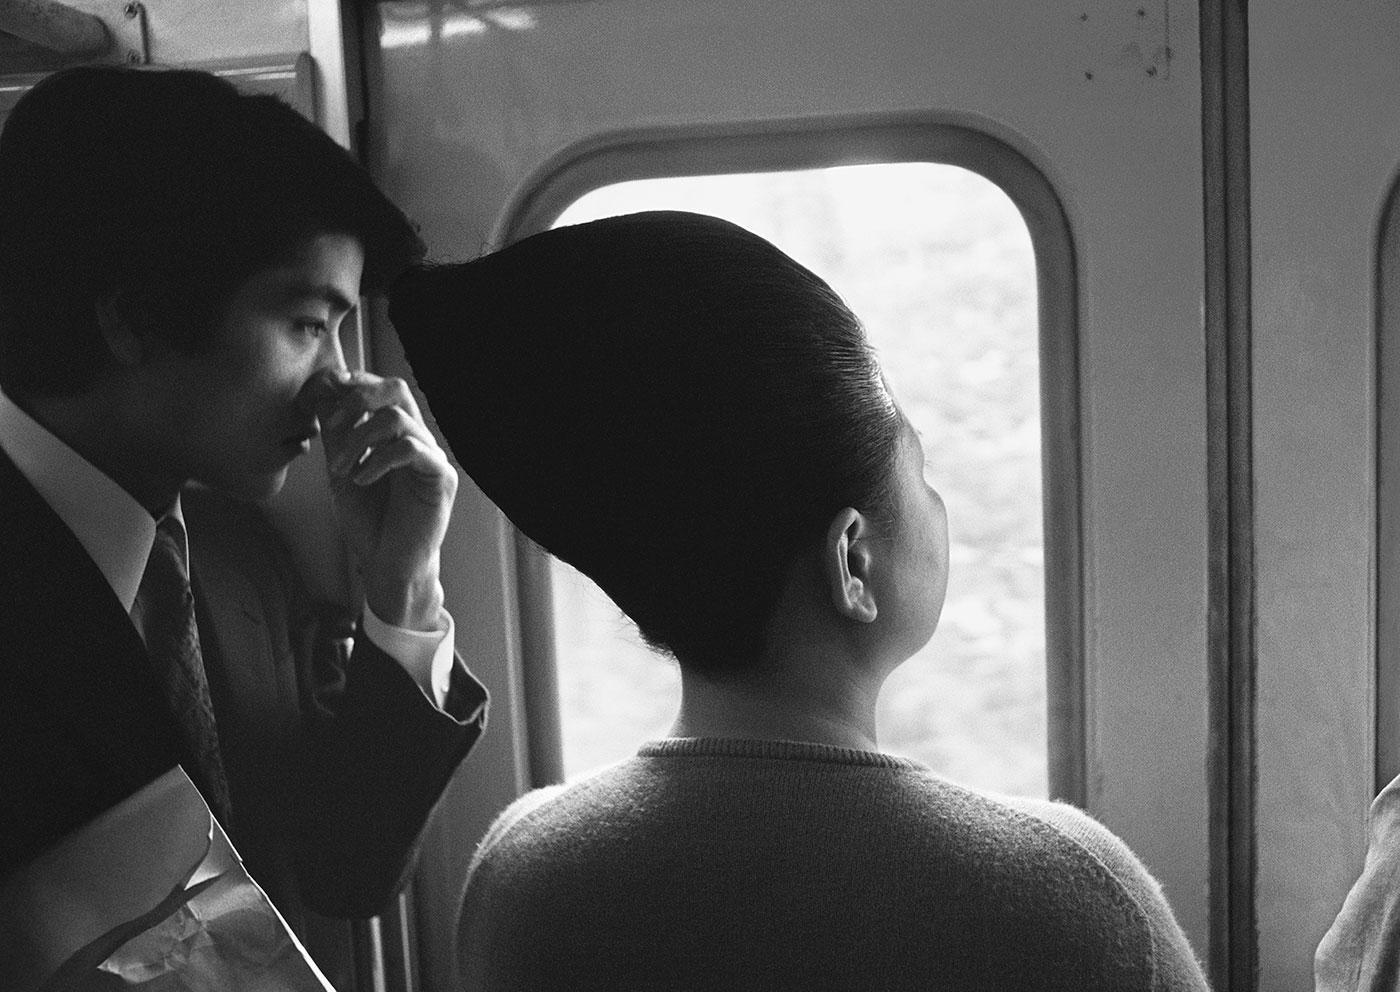 Le photographe japonais  Moriyama Tomatsu , Maison Européenne de la Photographie